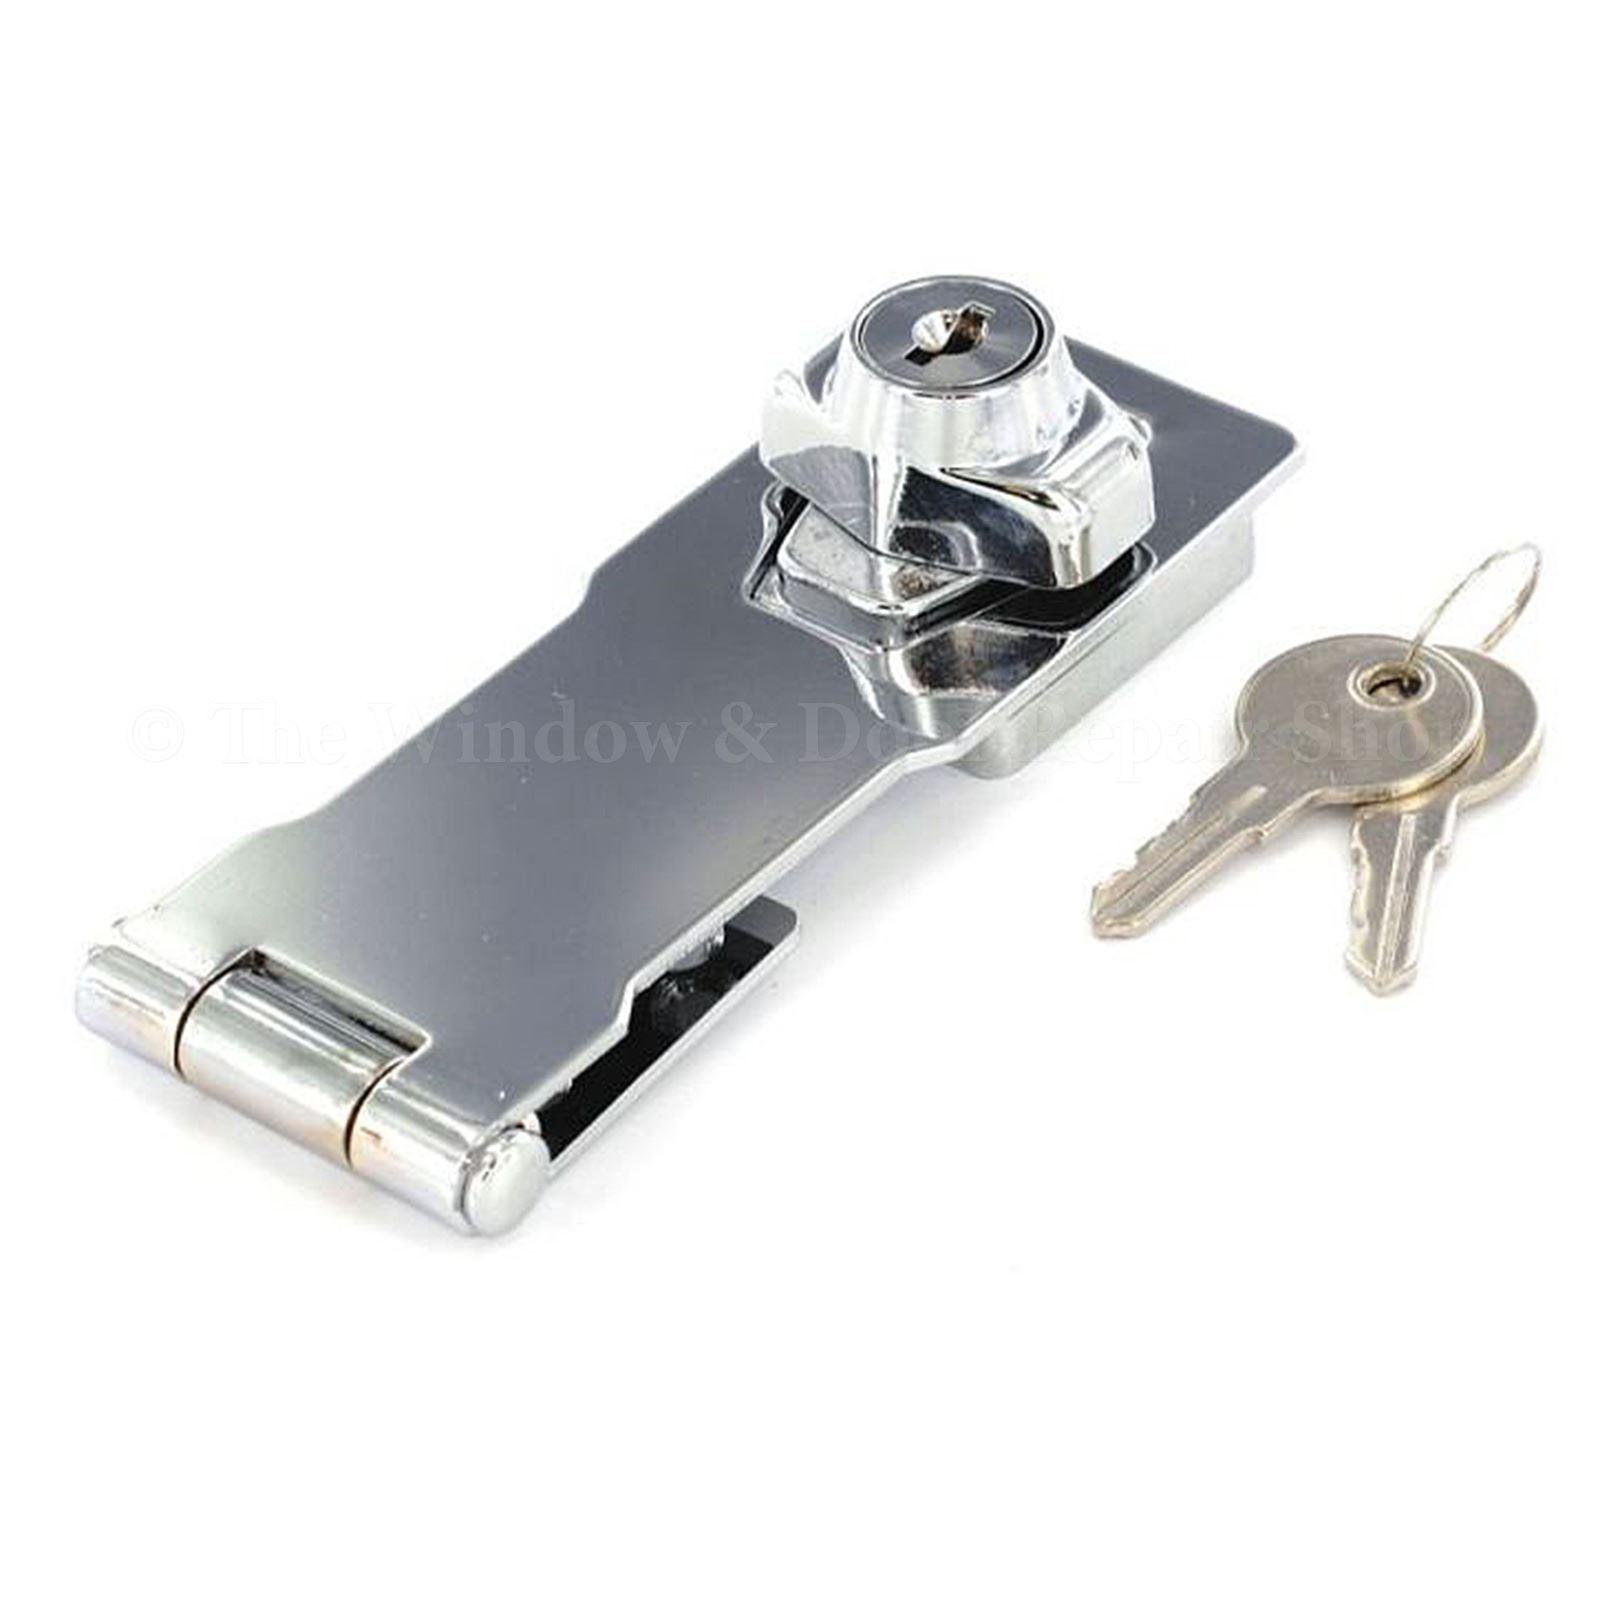 Garage Shed Gate Door Hasp Lock Staple Security Key